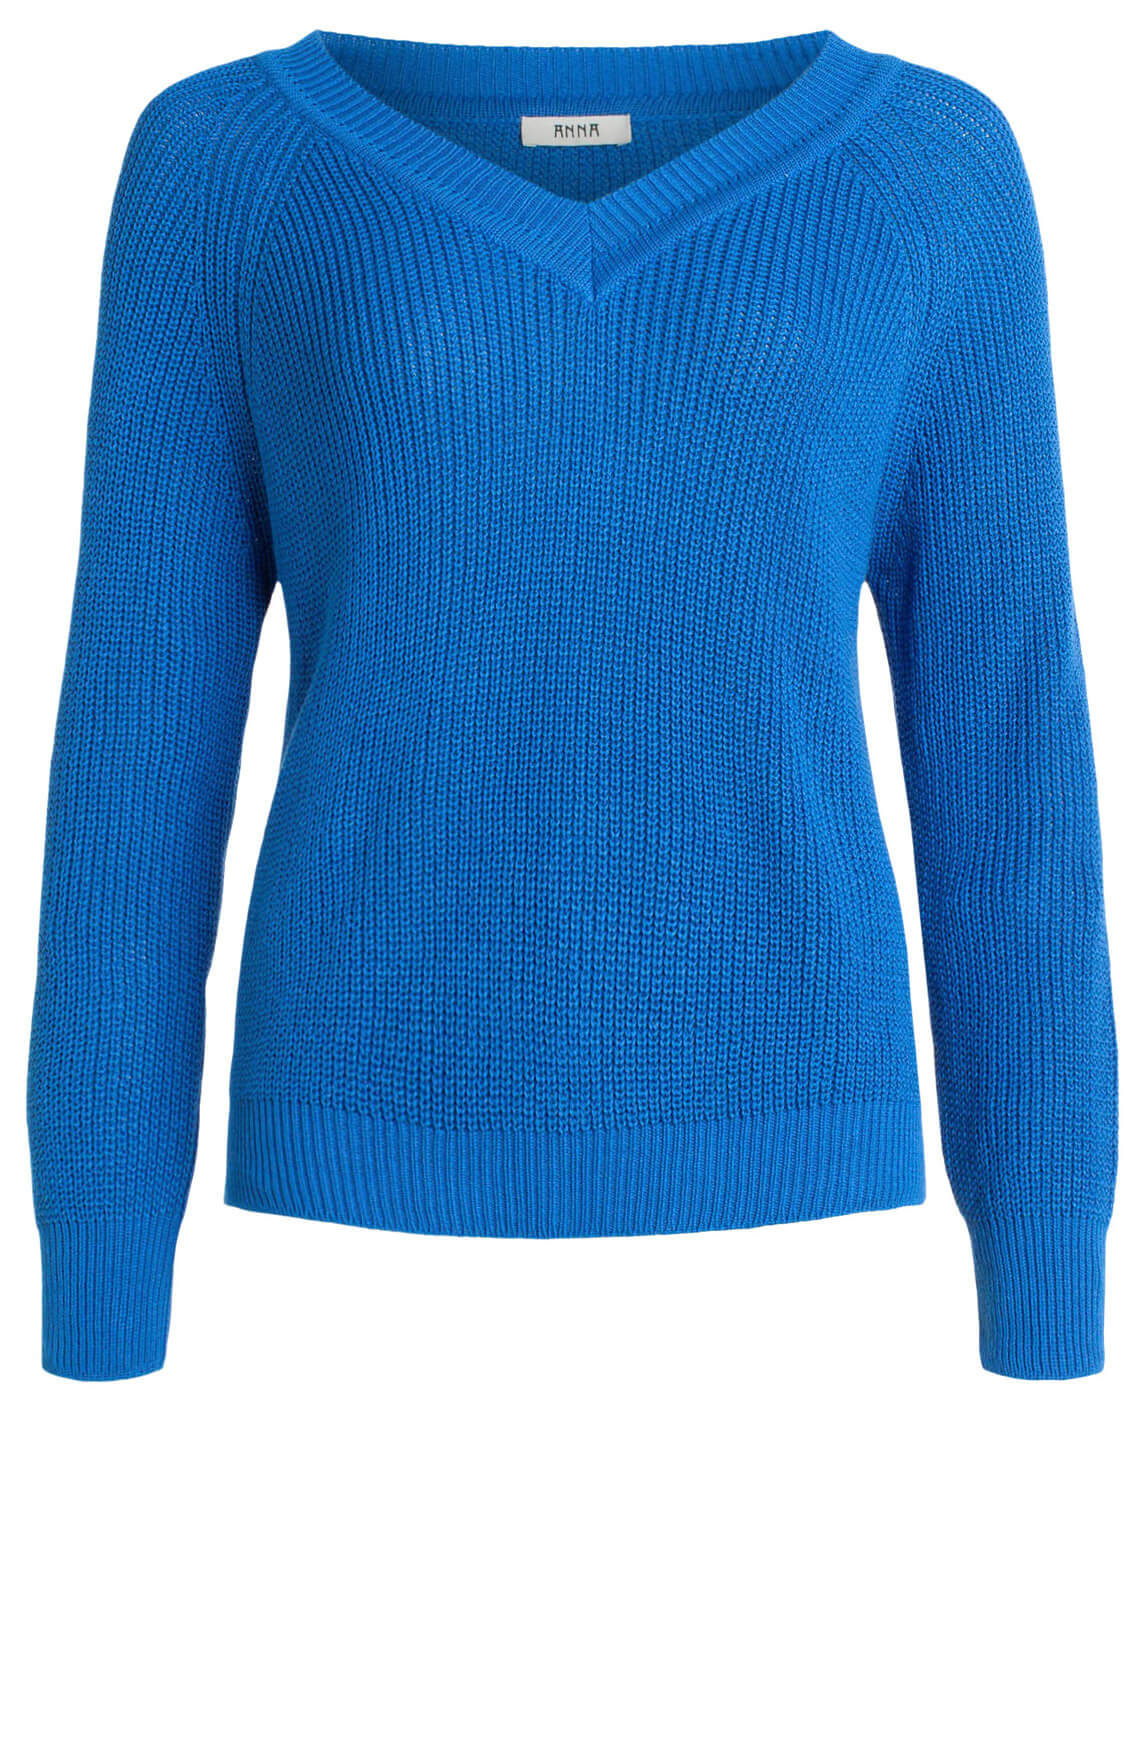 Anna Dames Gebreide trui Blauw